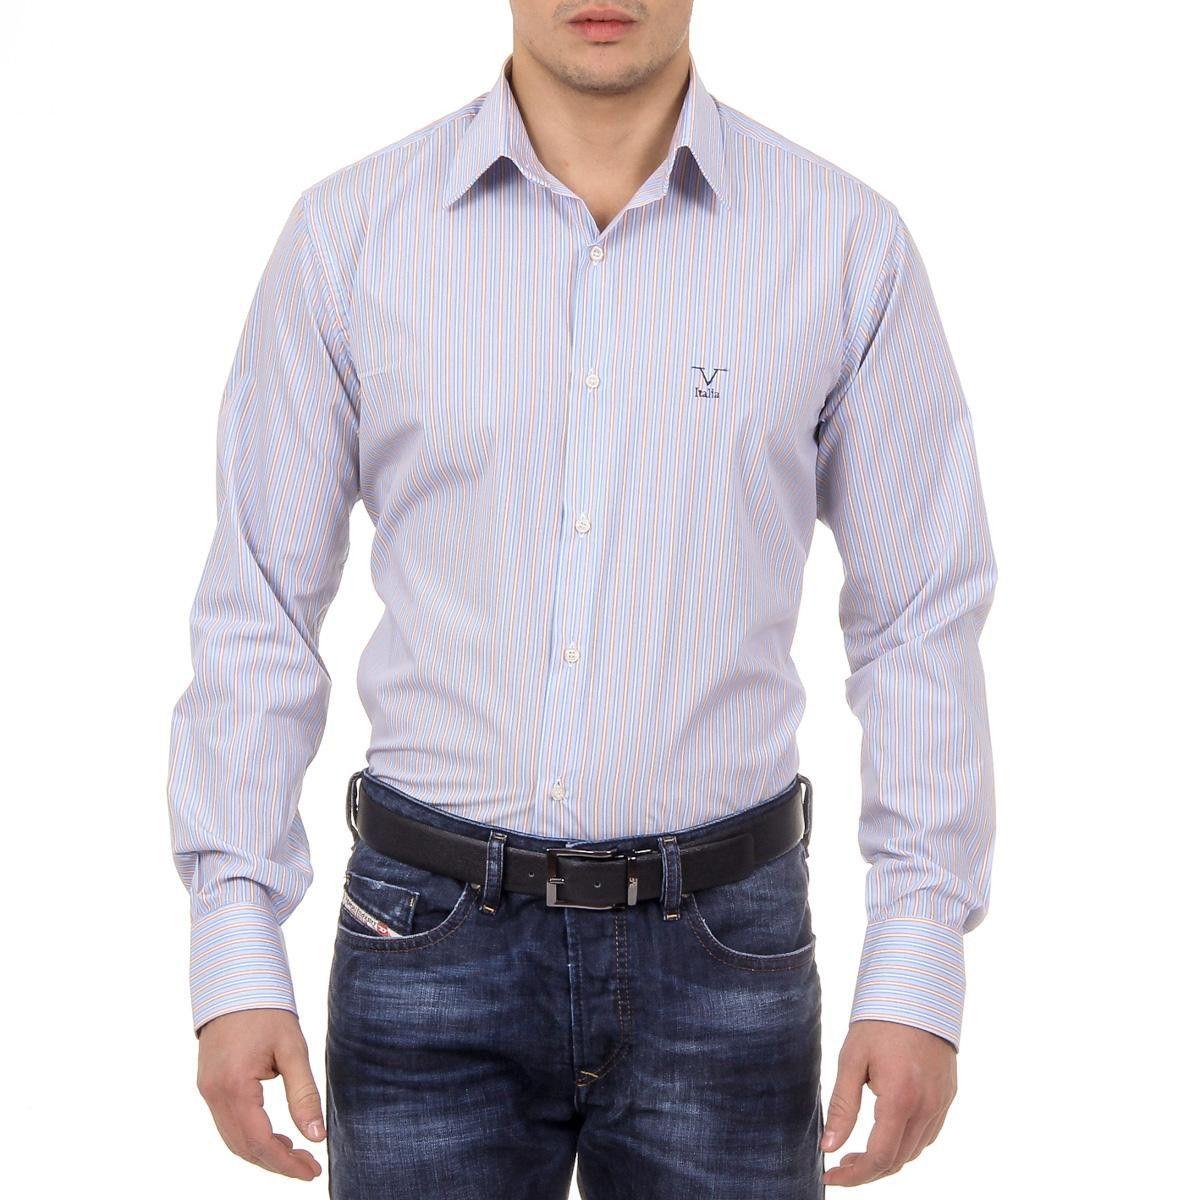 Versace 19.69 Abbigliamento Sportivo Srl Milano Italia Mens Classic Neck Shirt 377 ART. 522